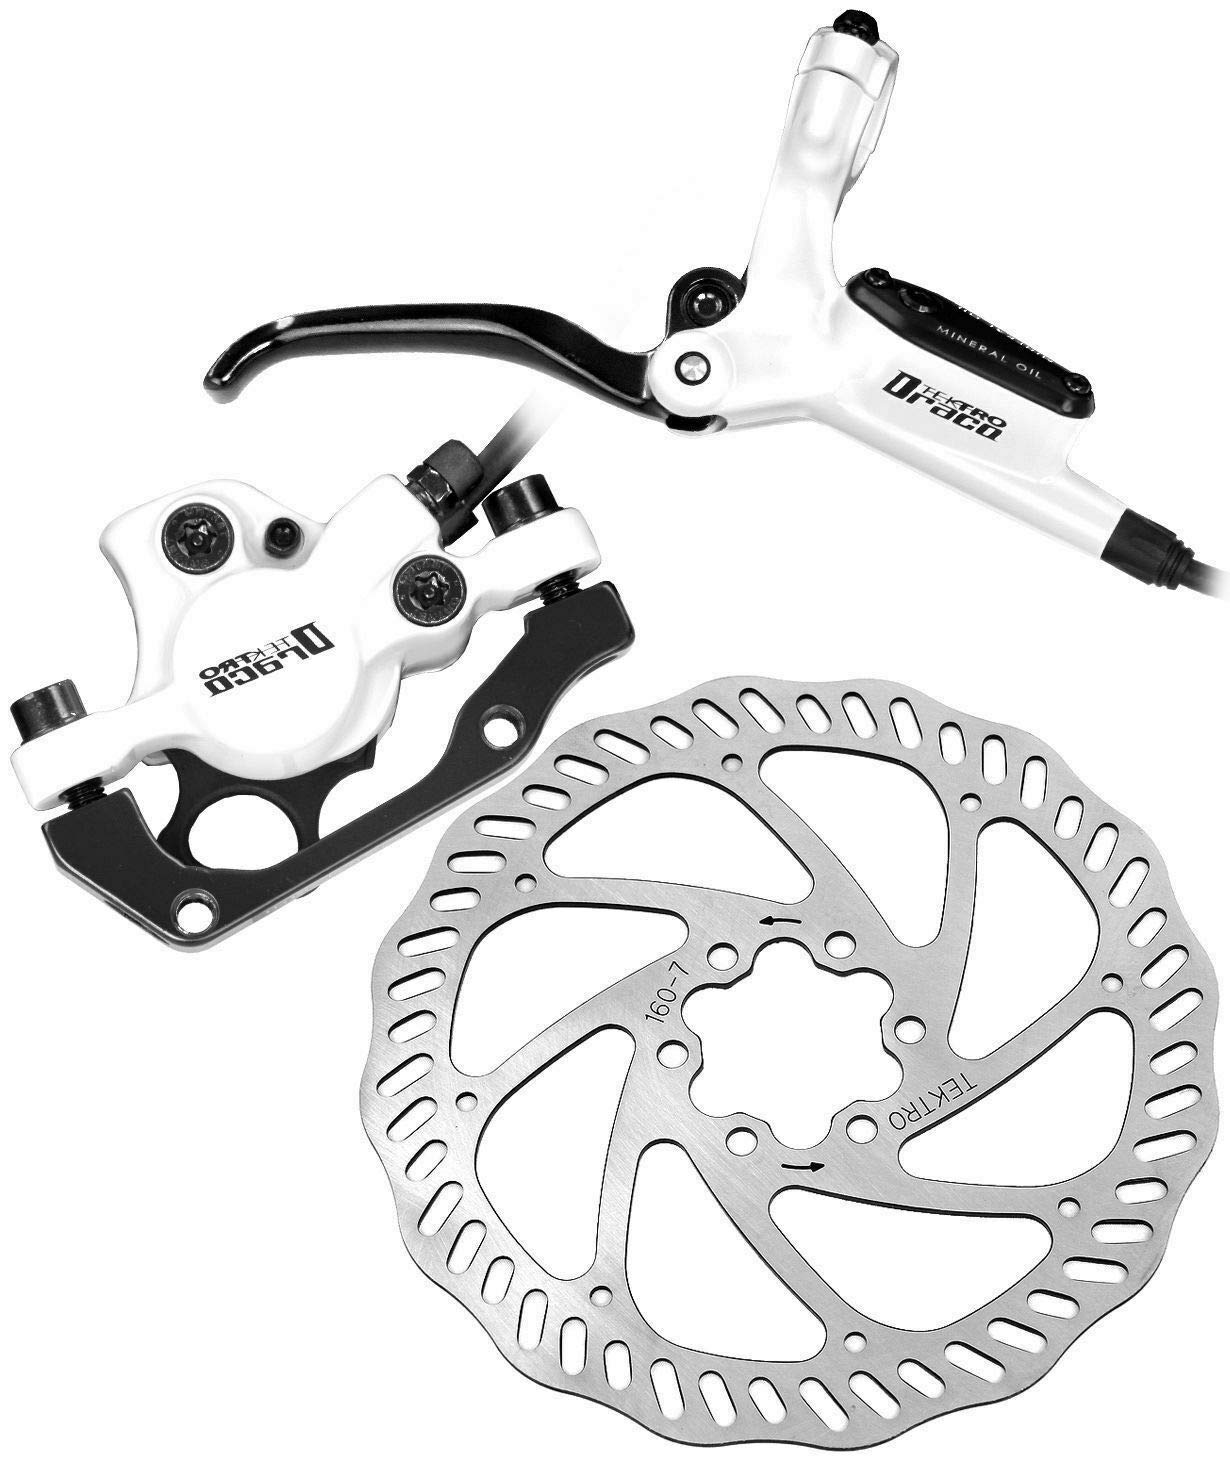 Tektro Draco Hydraulic Disc Brake Set with Levers Calipers and Rotors